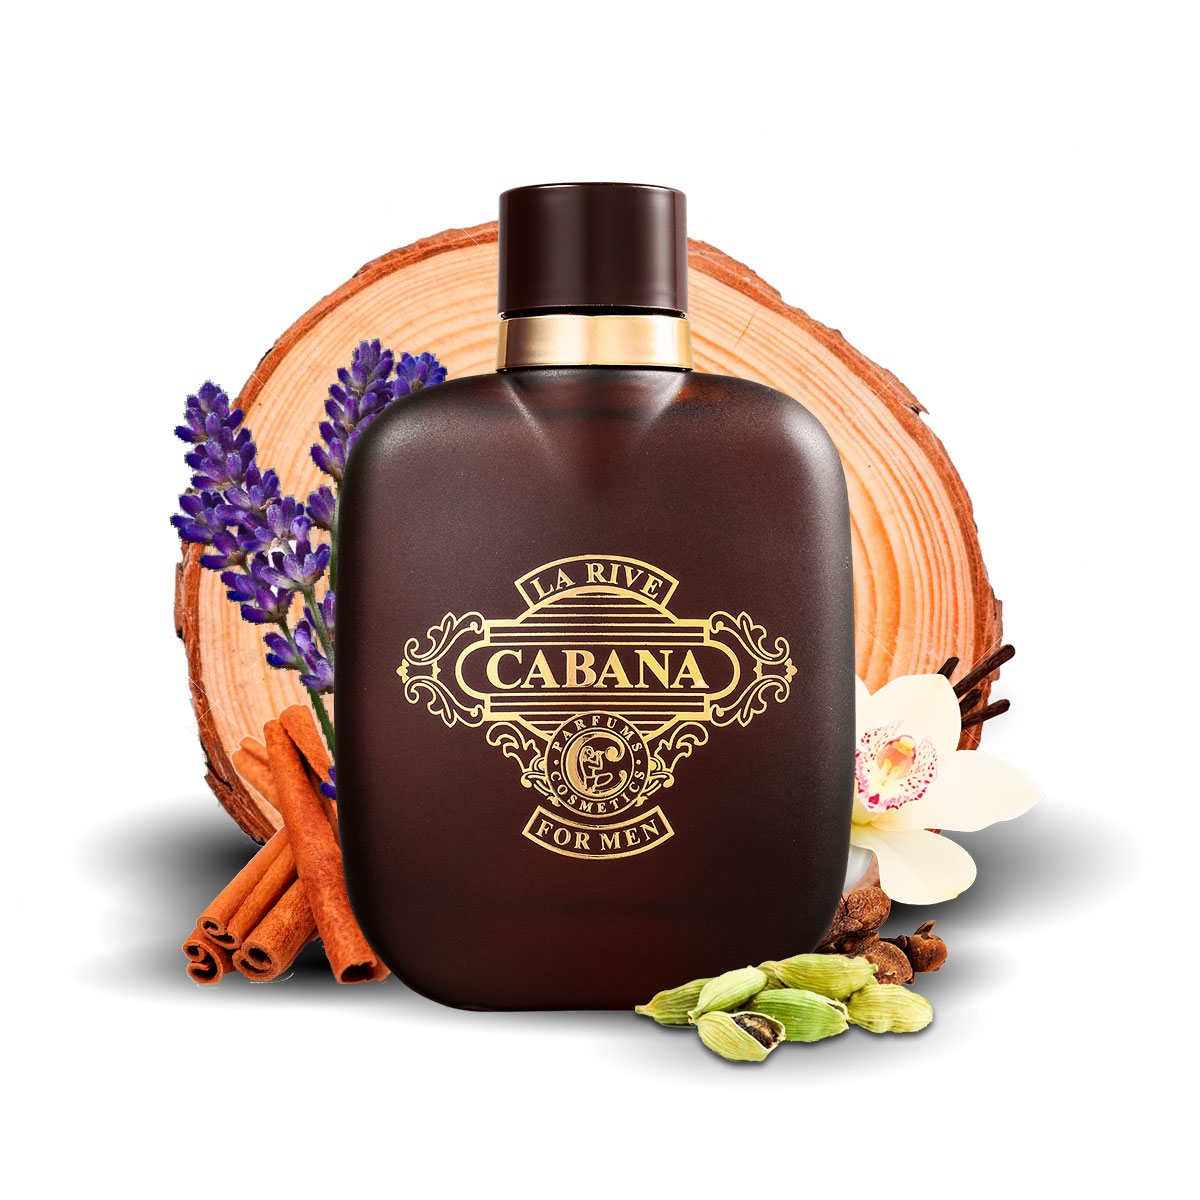 Kit 2 Perfumes Importados My Only Wish e Cabana La Rive